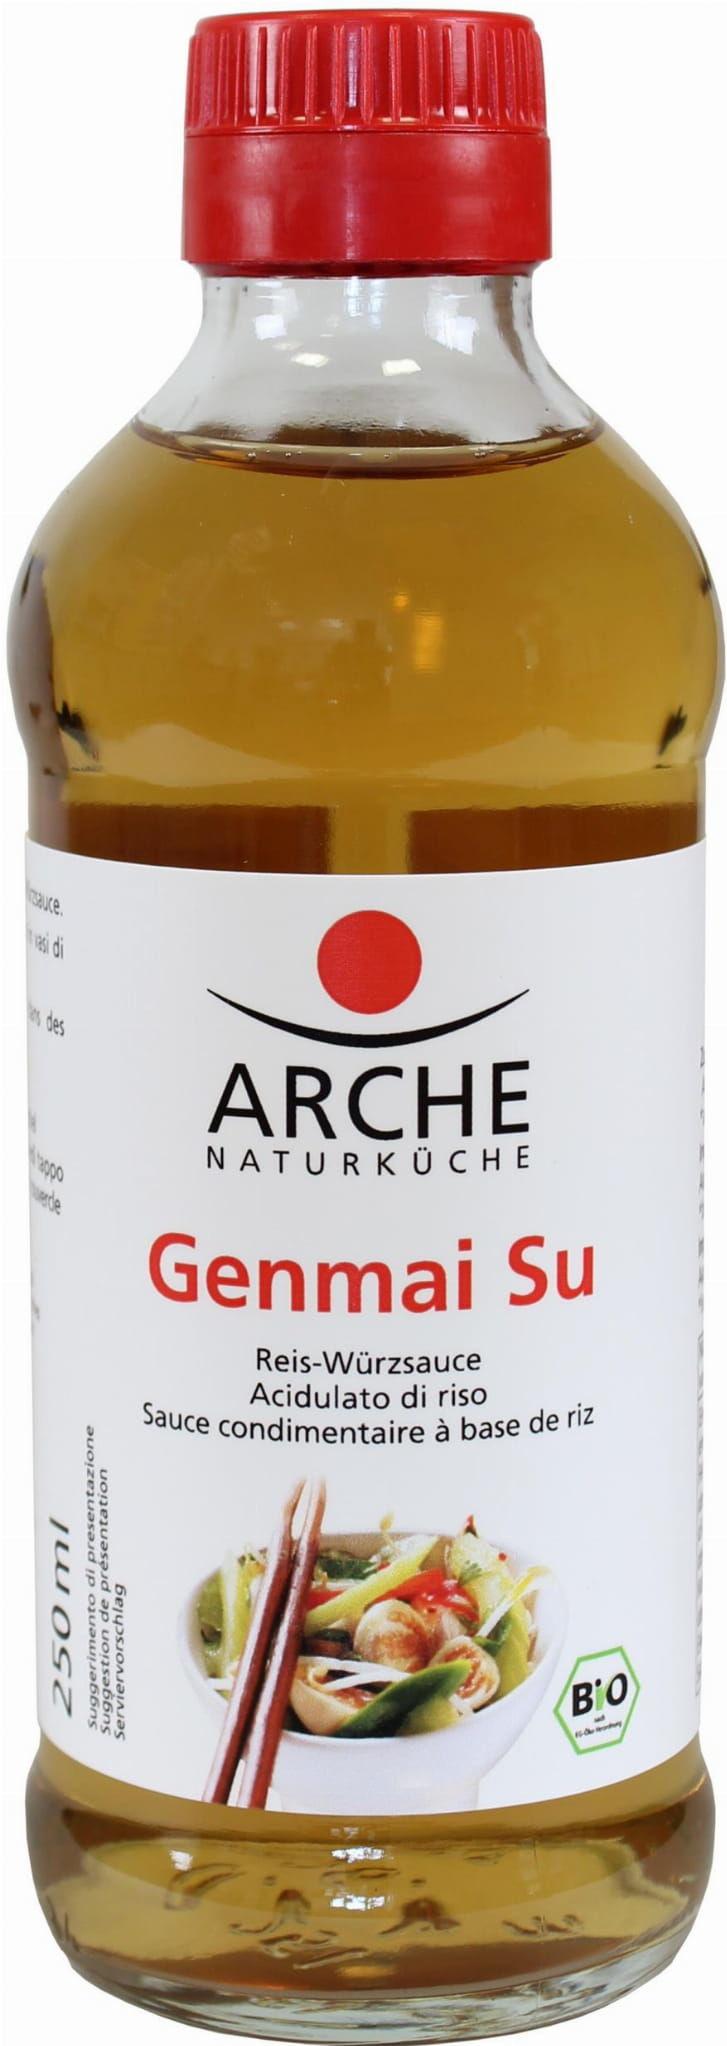 Ocet ryżowy genmai su bio 250 ml - arche